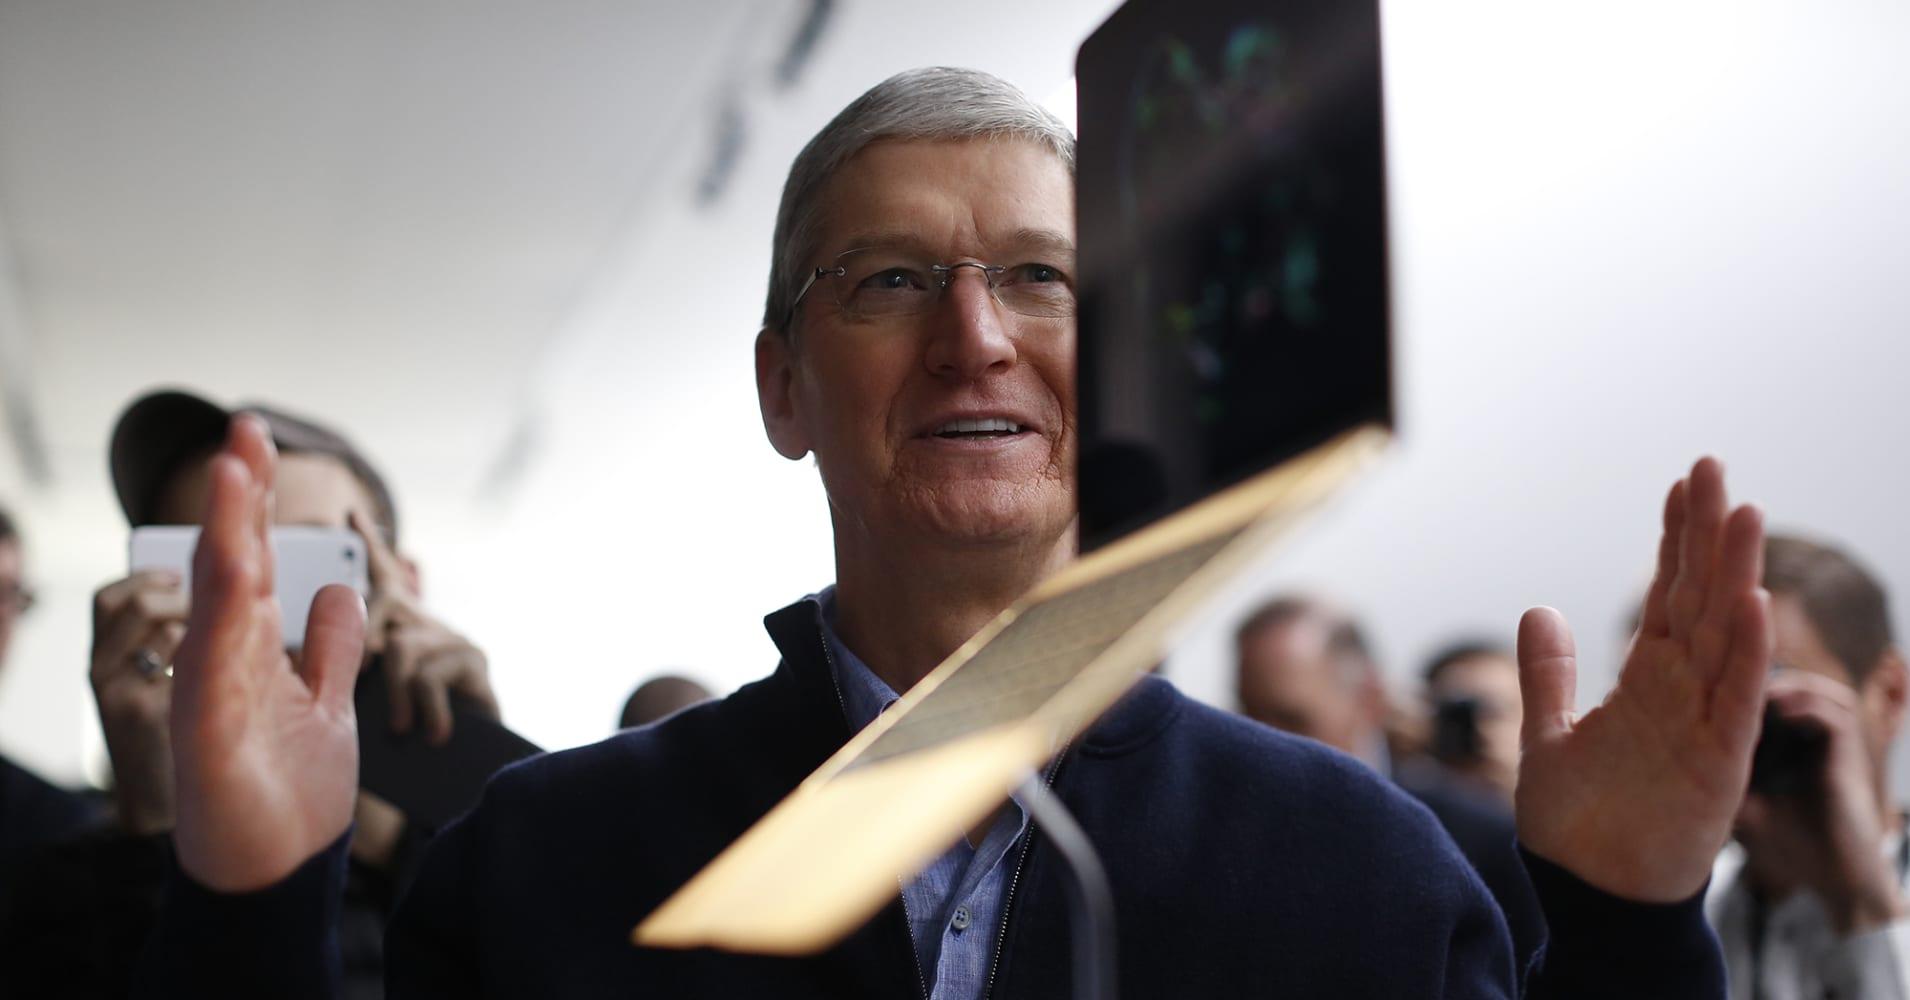 Kuo: Apple to launch MacBook, iPad, monitor with mini LED display